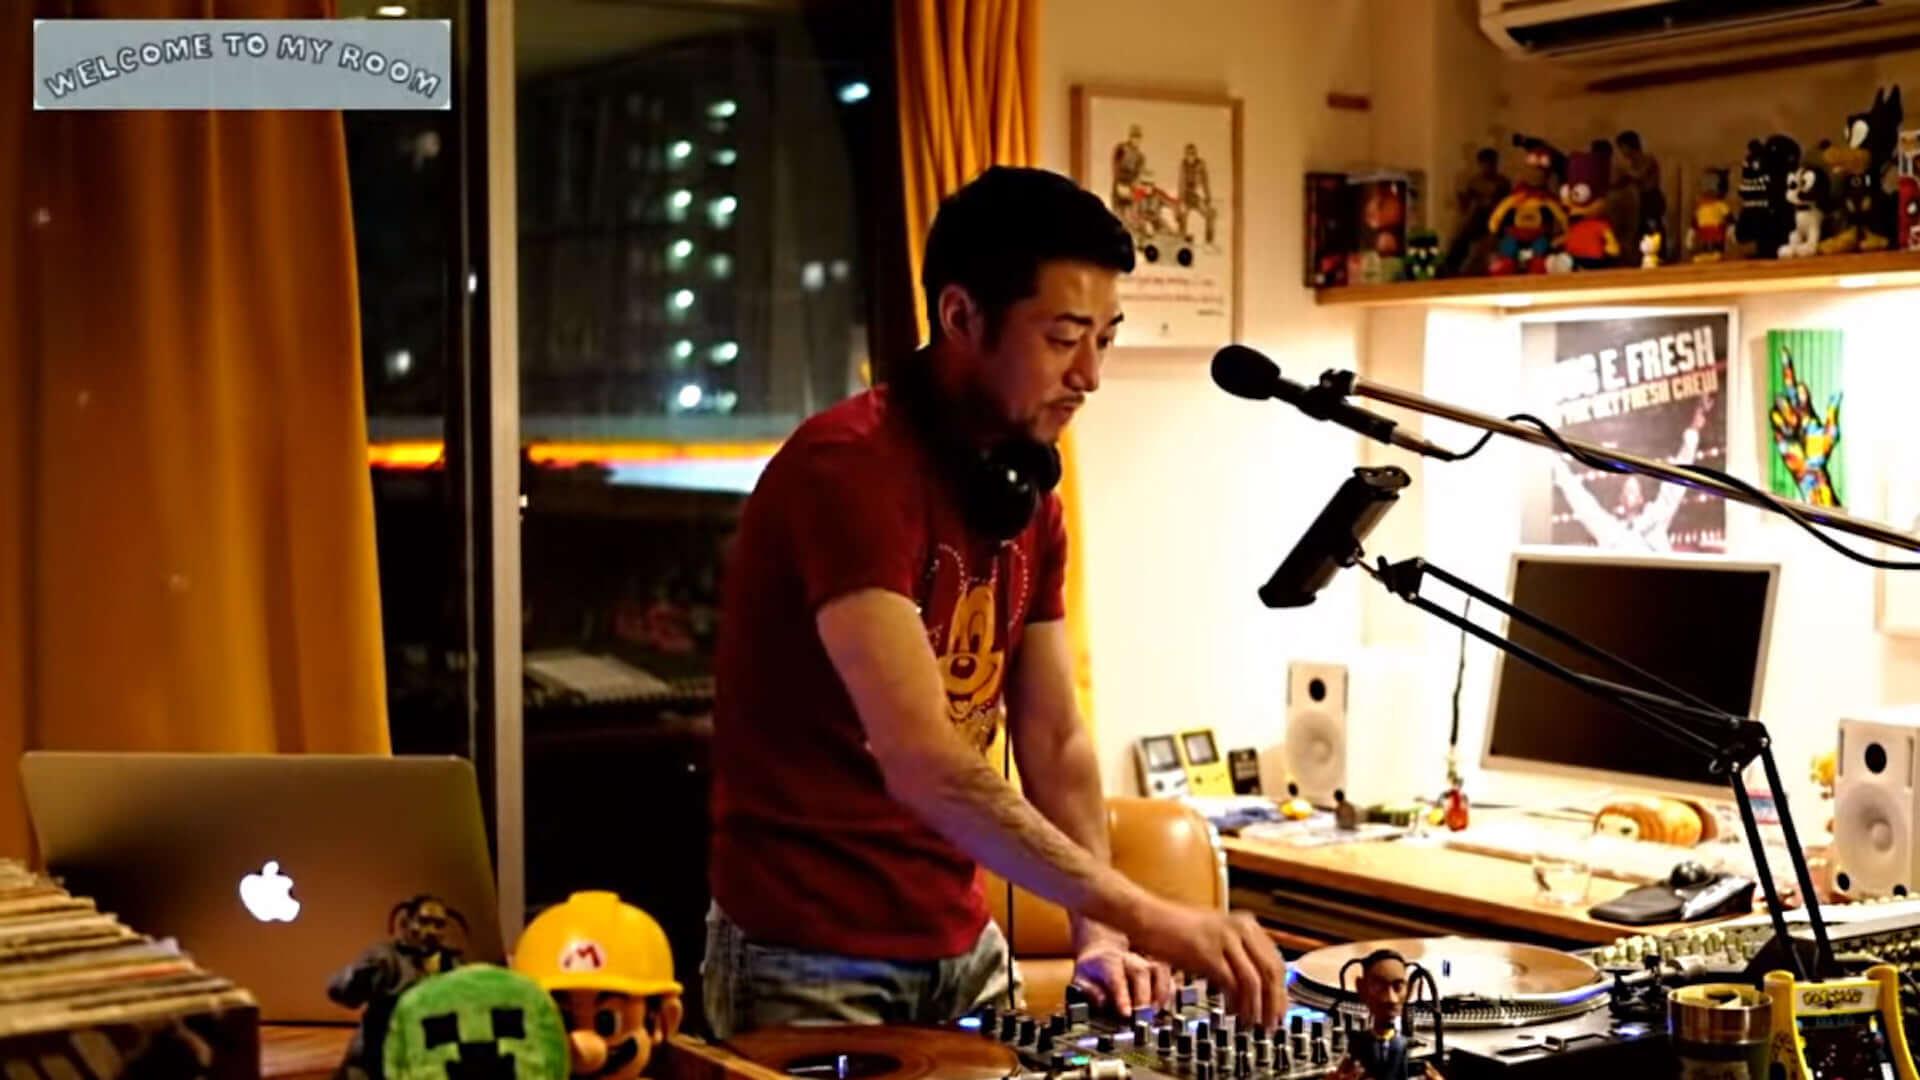 "DJ HASEBEの活動30周年記念アルバムから""Welcome to my room""のMVが解禁!Ryohu、土岐麻子も出演 music200923_dj_hasebe_4-1920x1080"